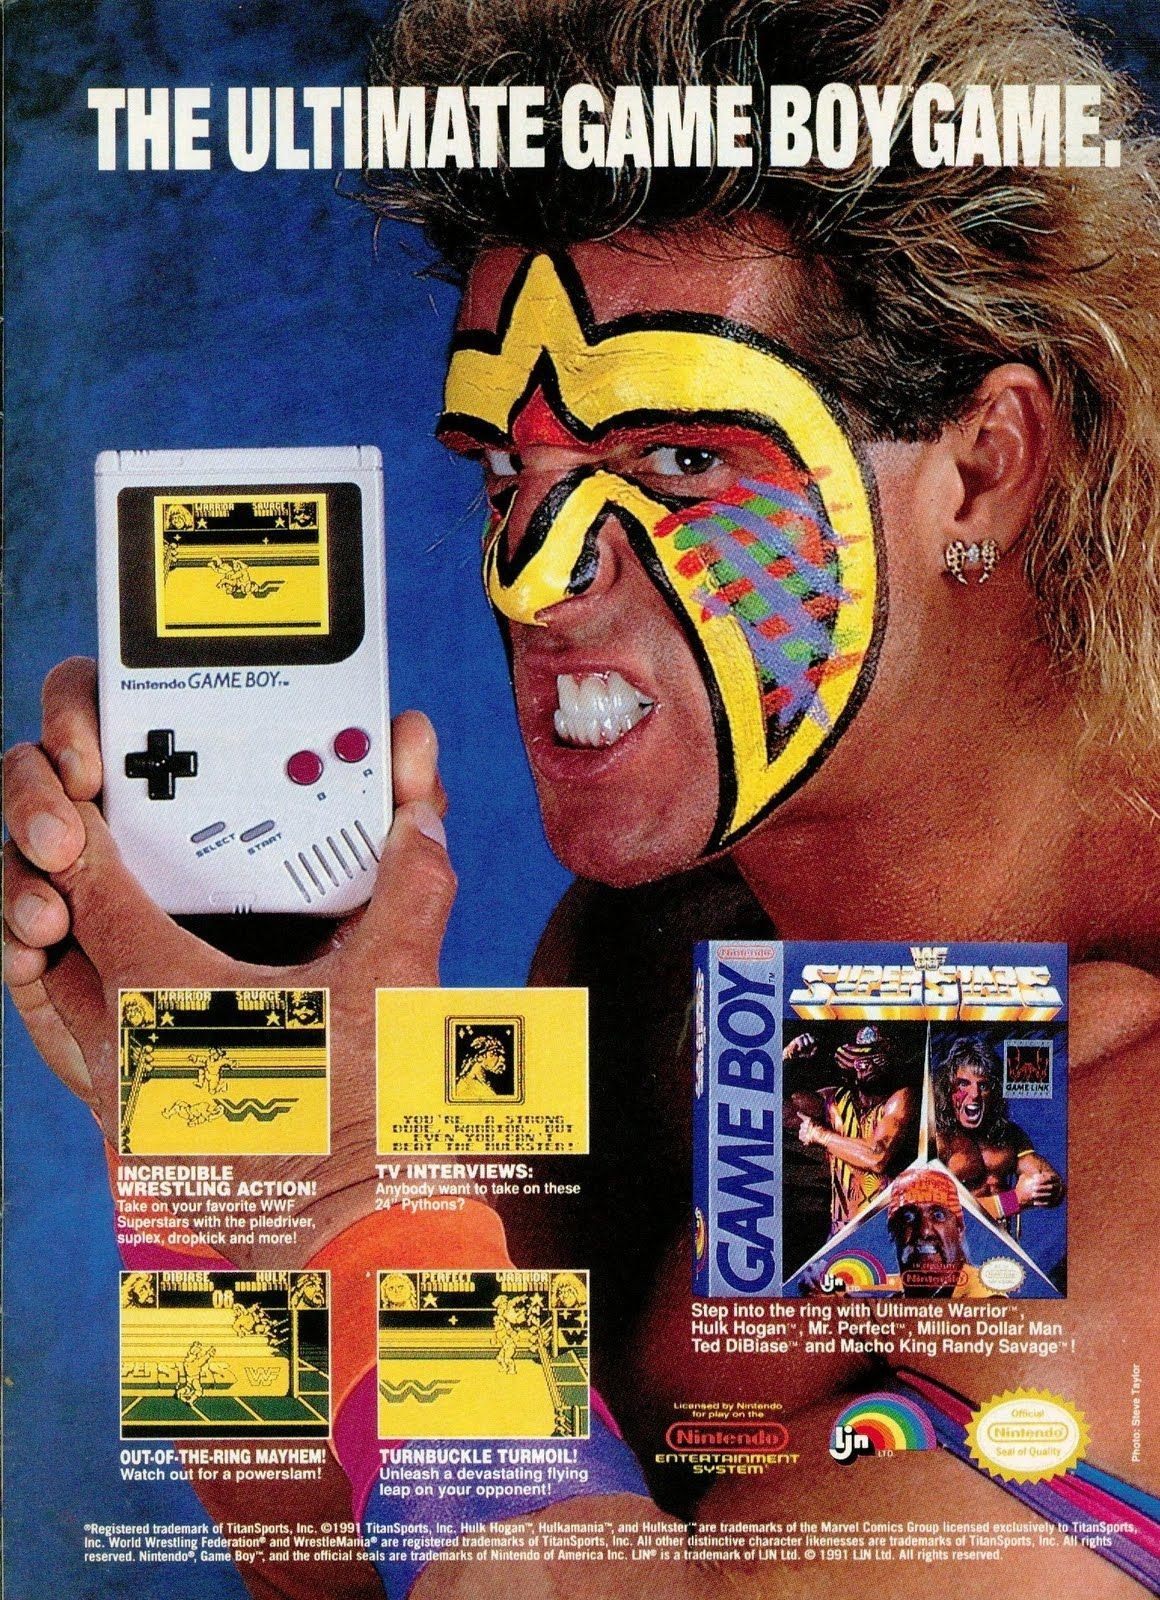 Wwf Super Stars Gameboy Game Retro Games Poster Wwf Superstars Handheld Video Games